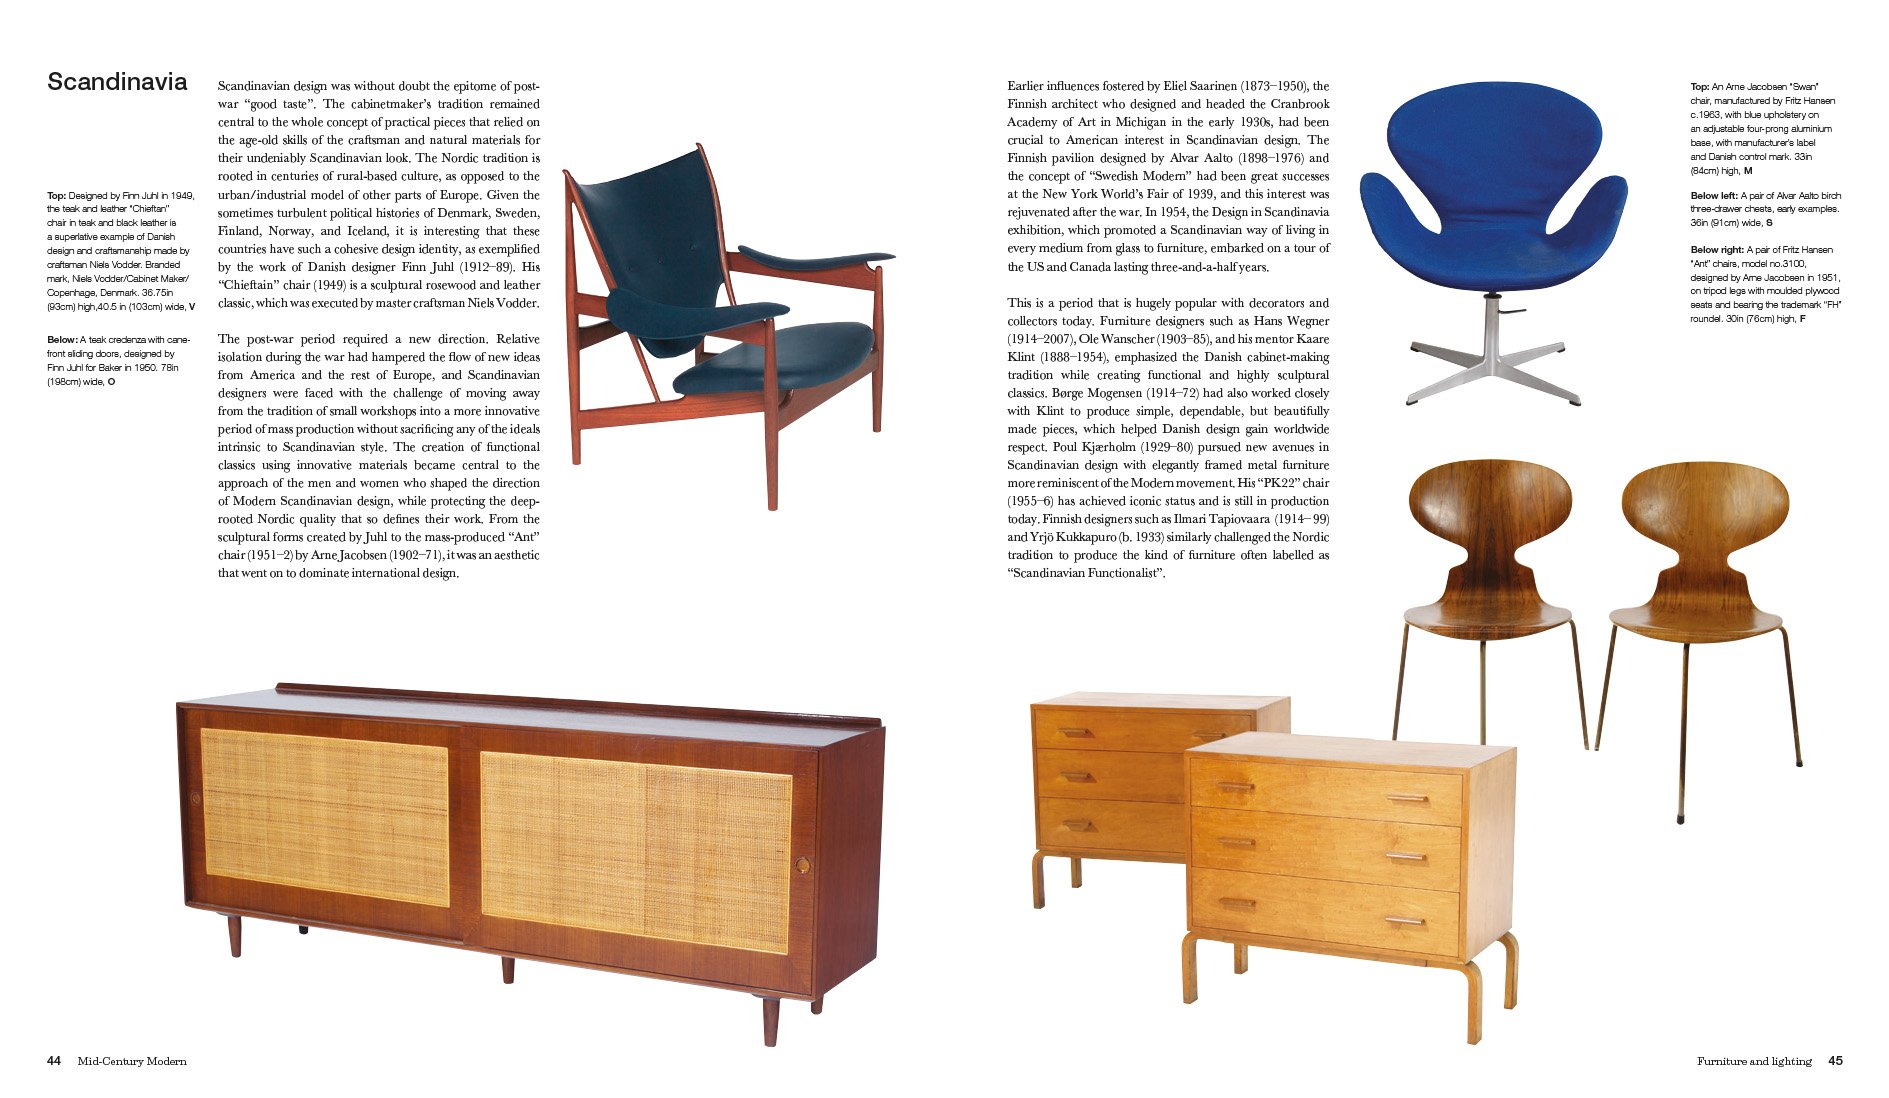 Miller S Mid Century Modern Living With Mid Century Modern Design Miller Judith 9781784723750 Amazon Com Books